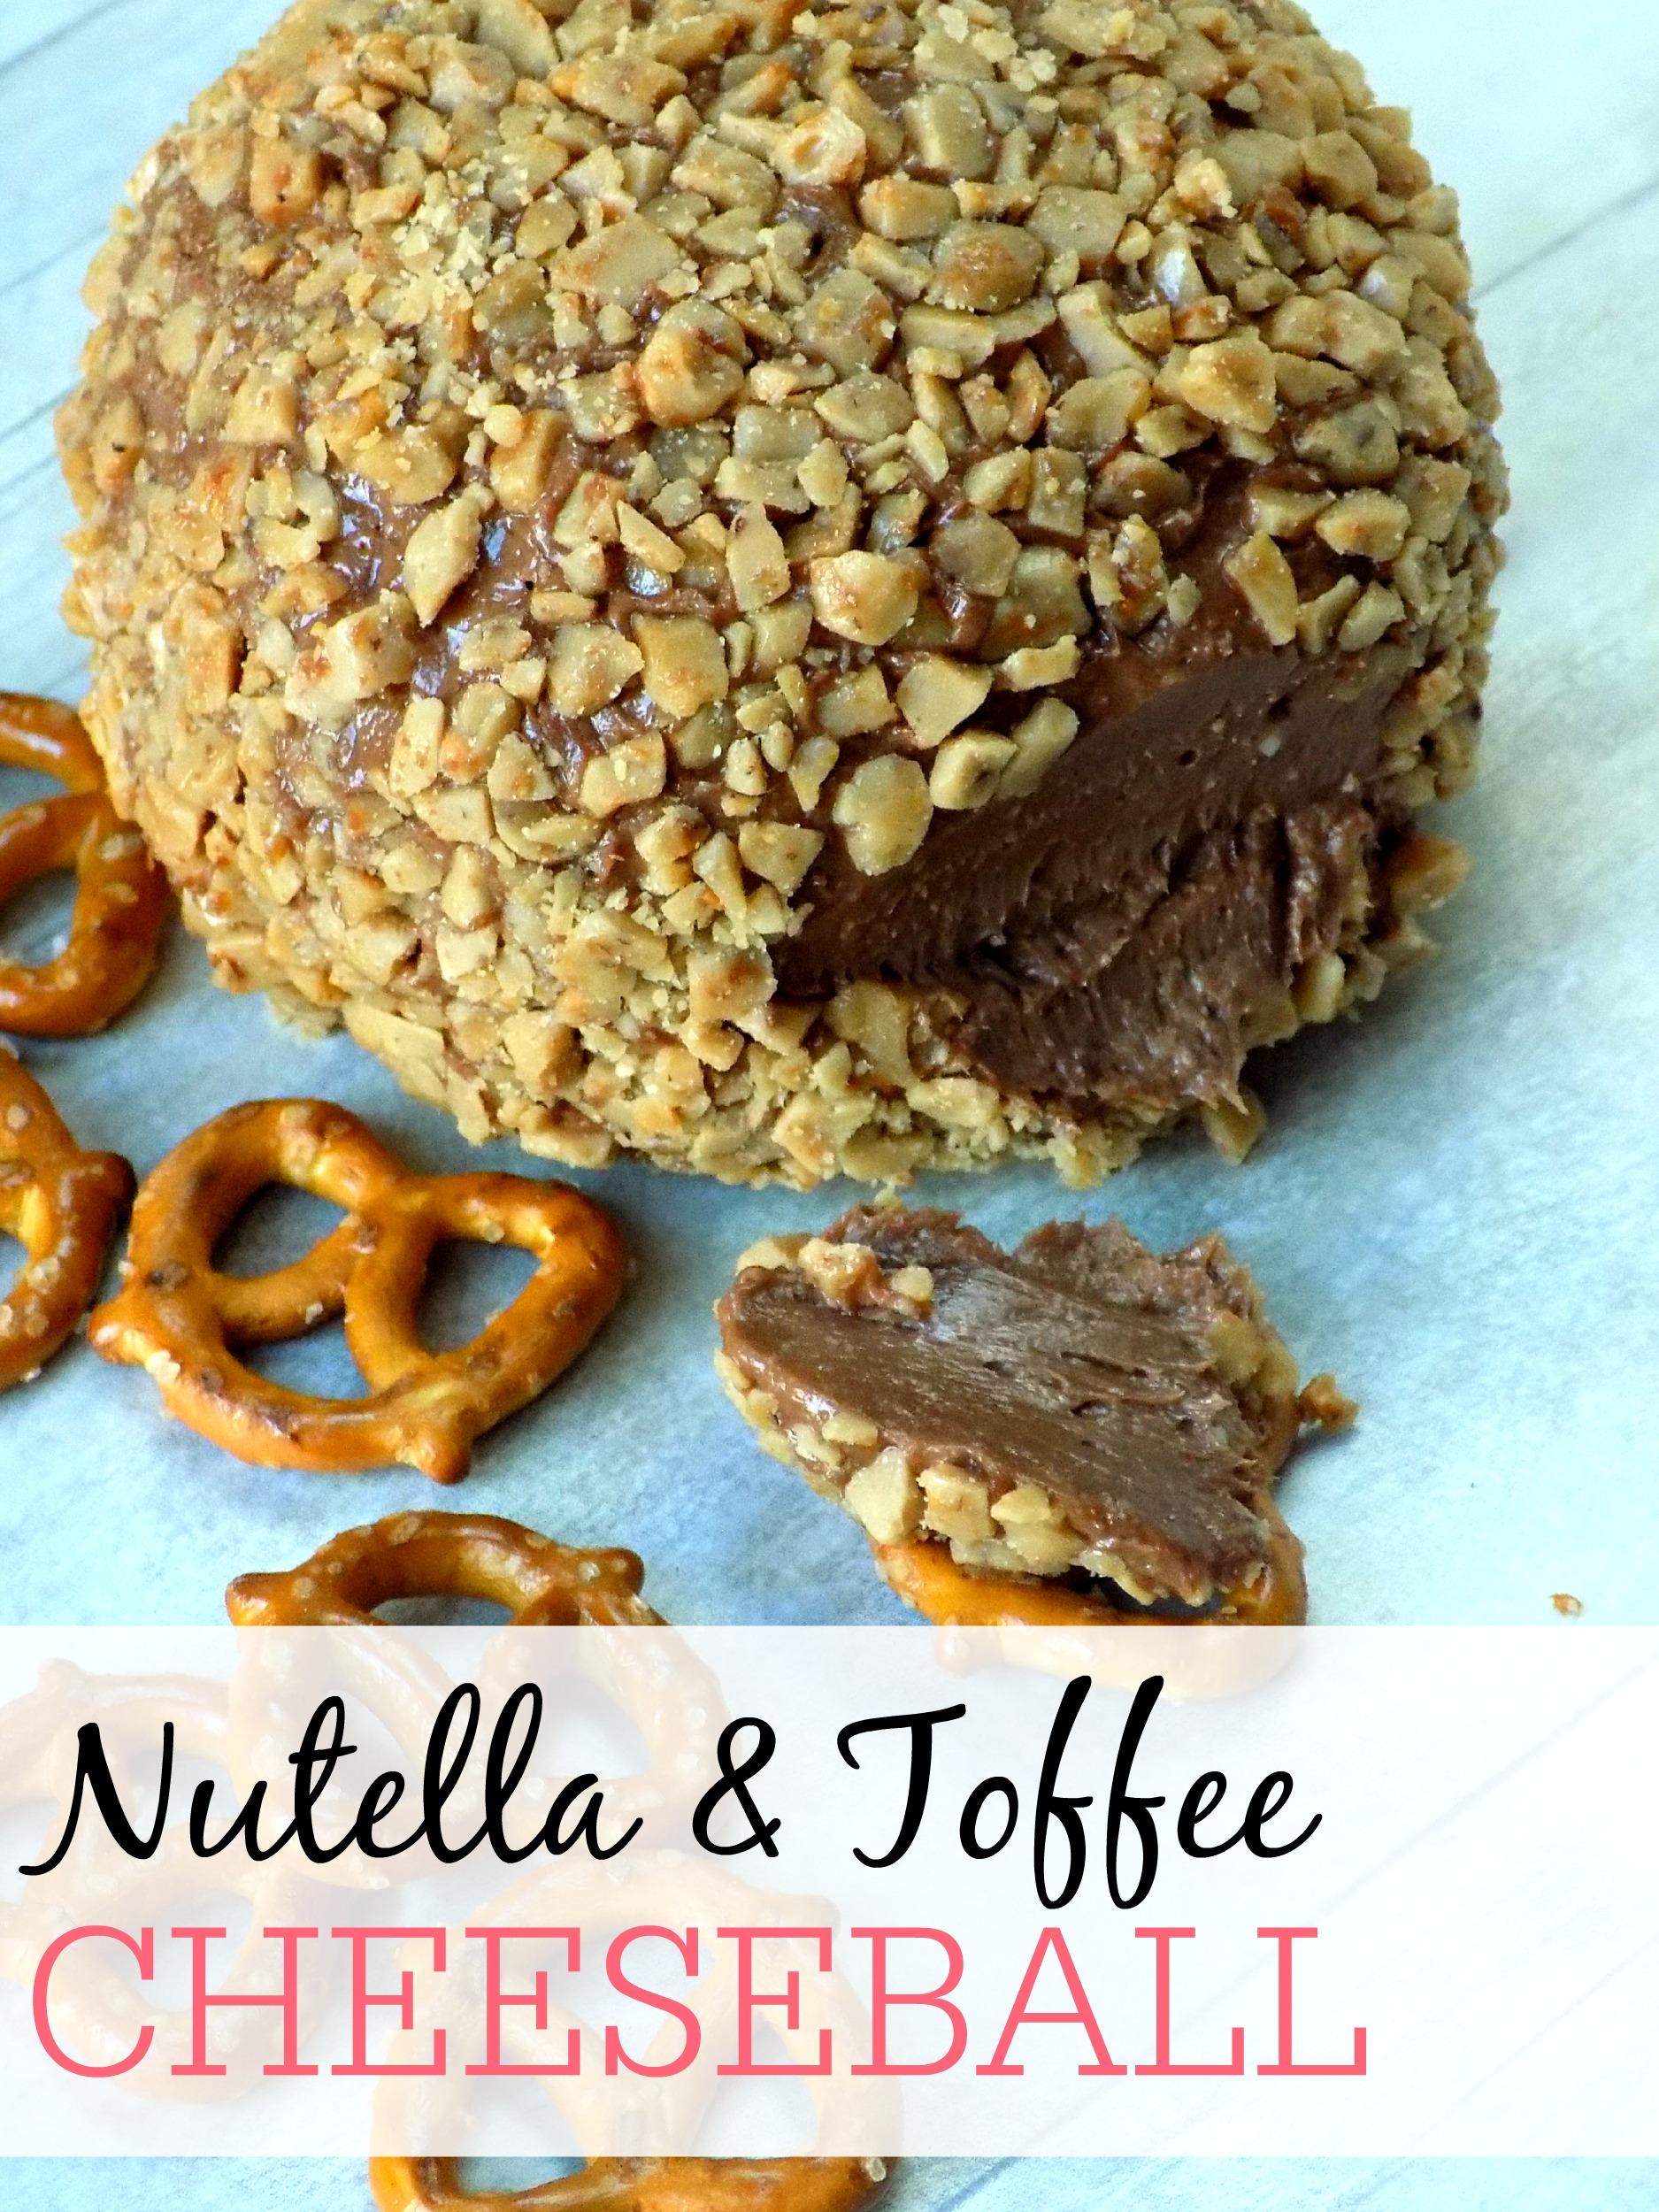 Nutella and Toffee Dessert Cheeseball